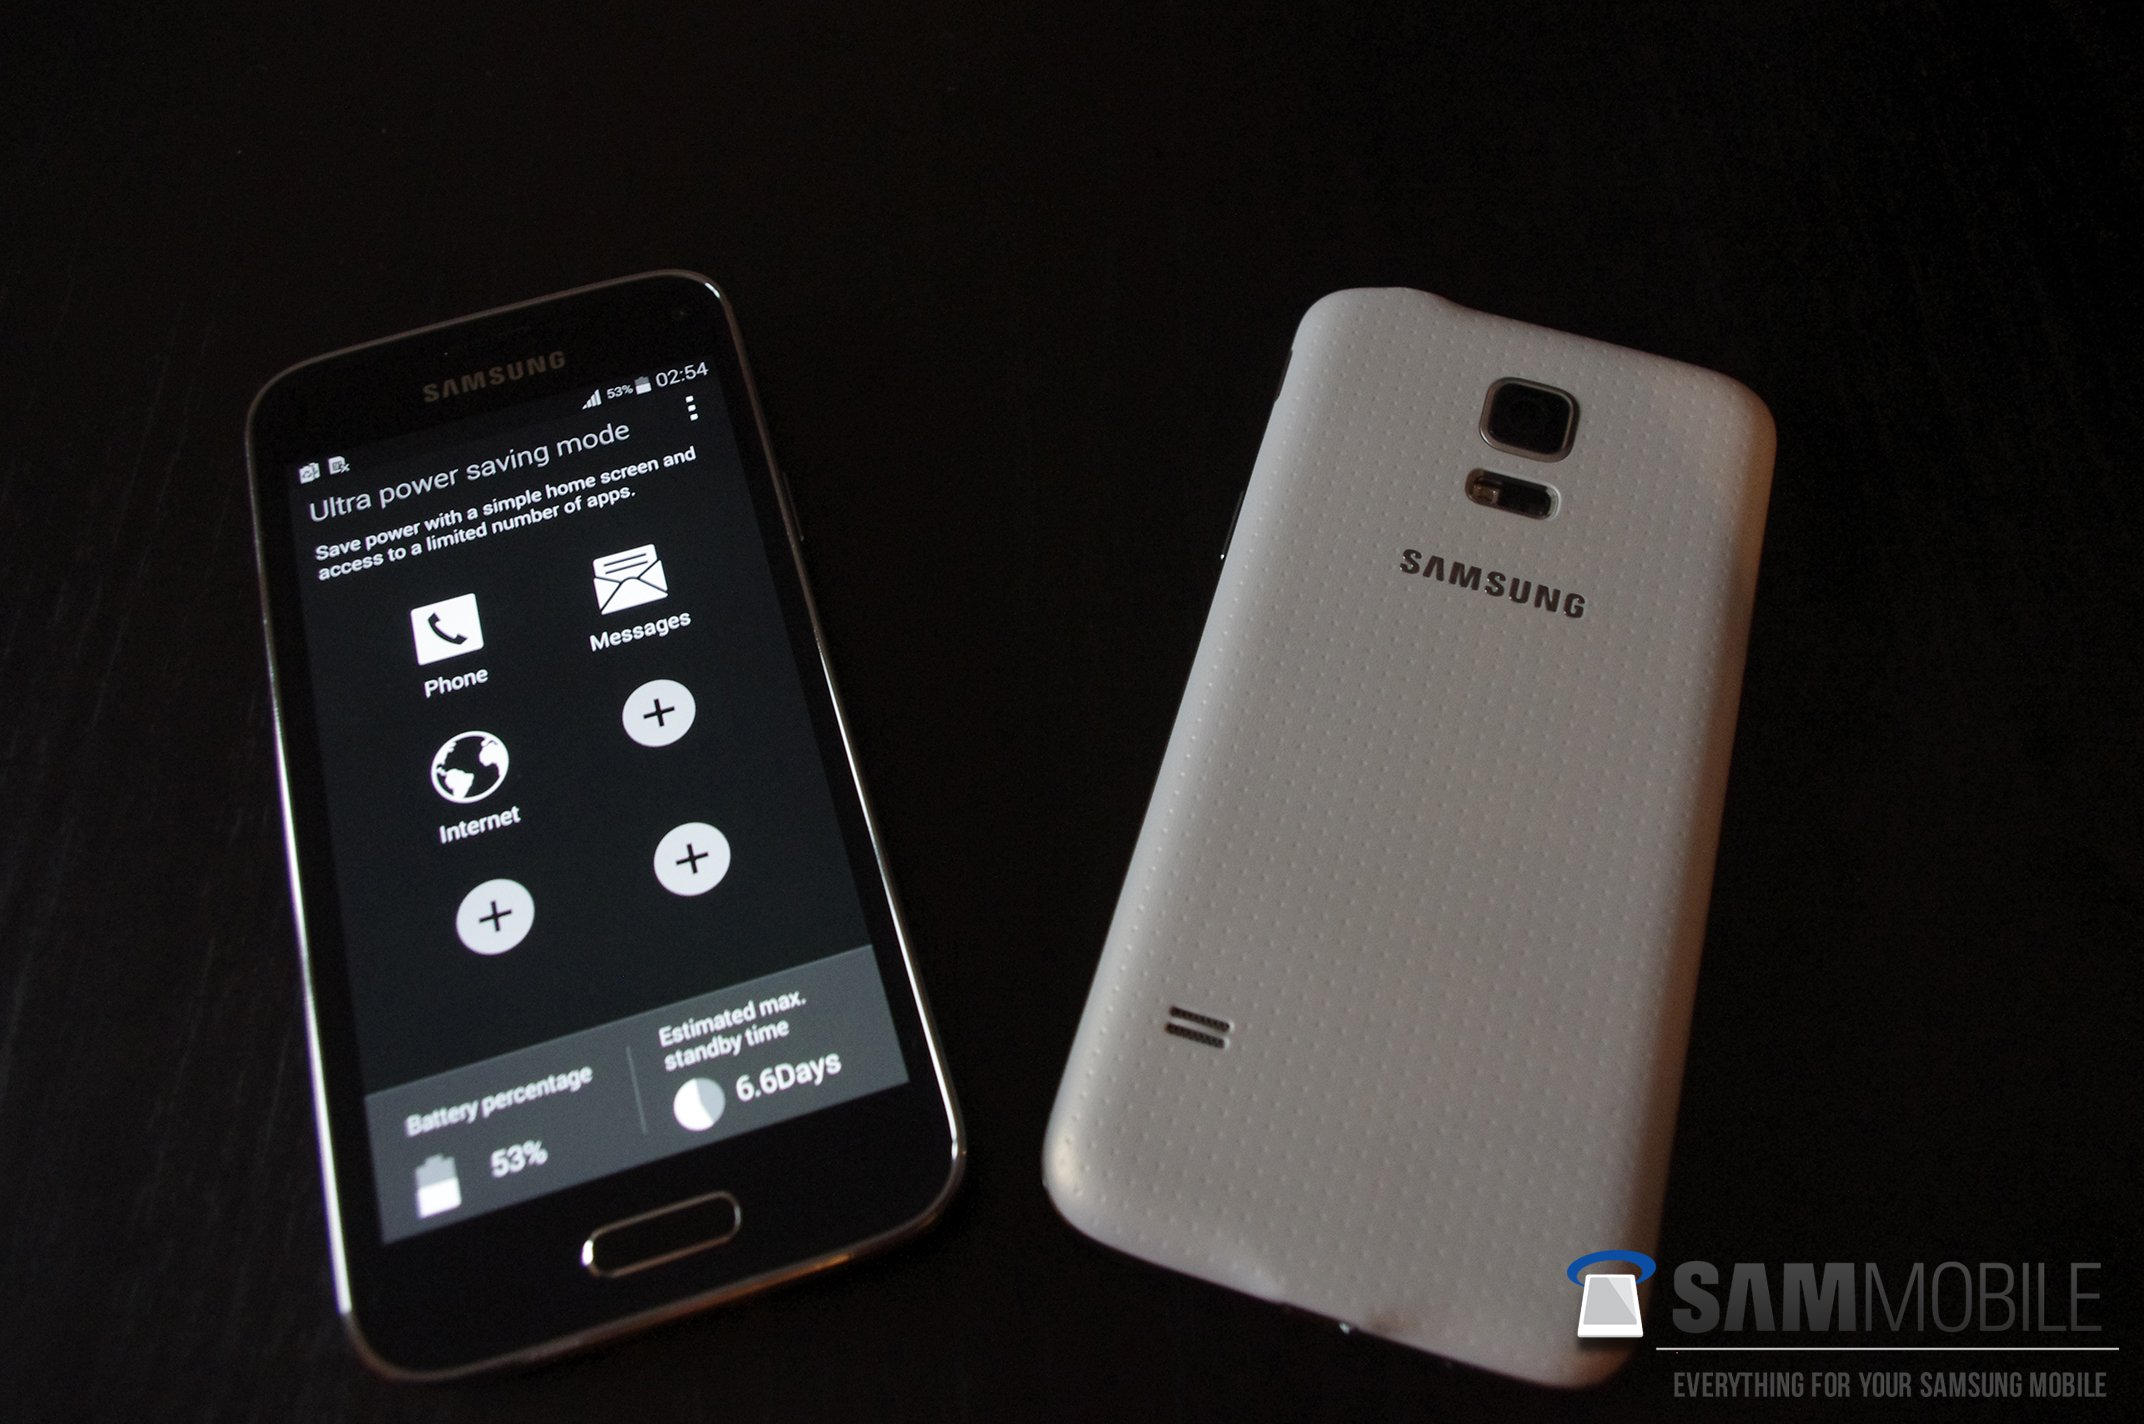 Samsung Galaxy Mini S5, Analysis